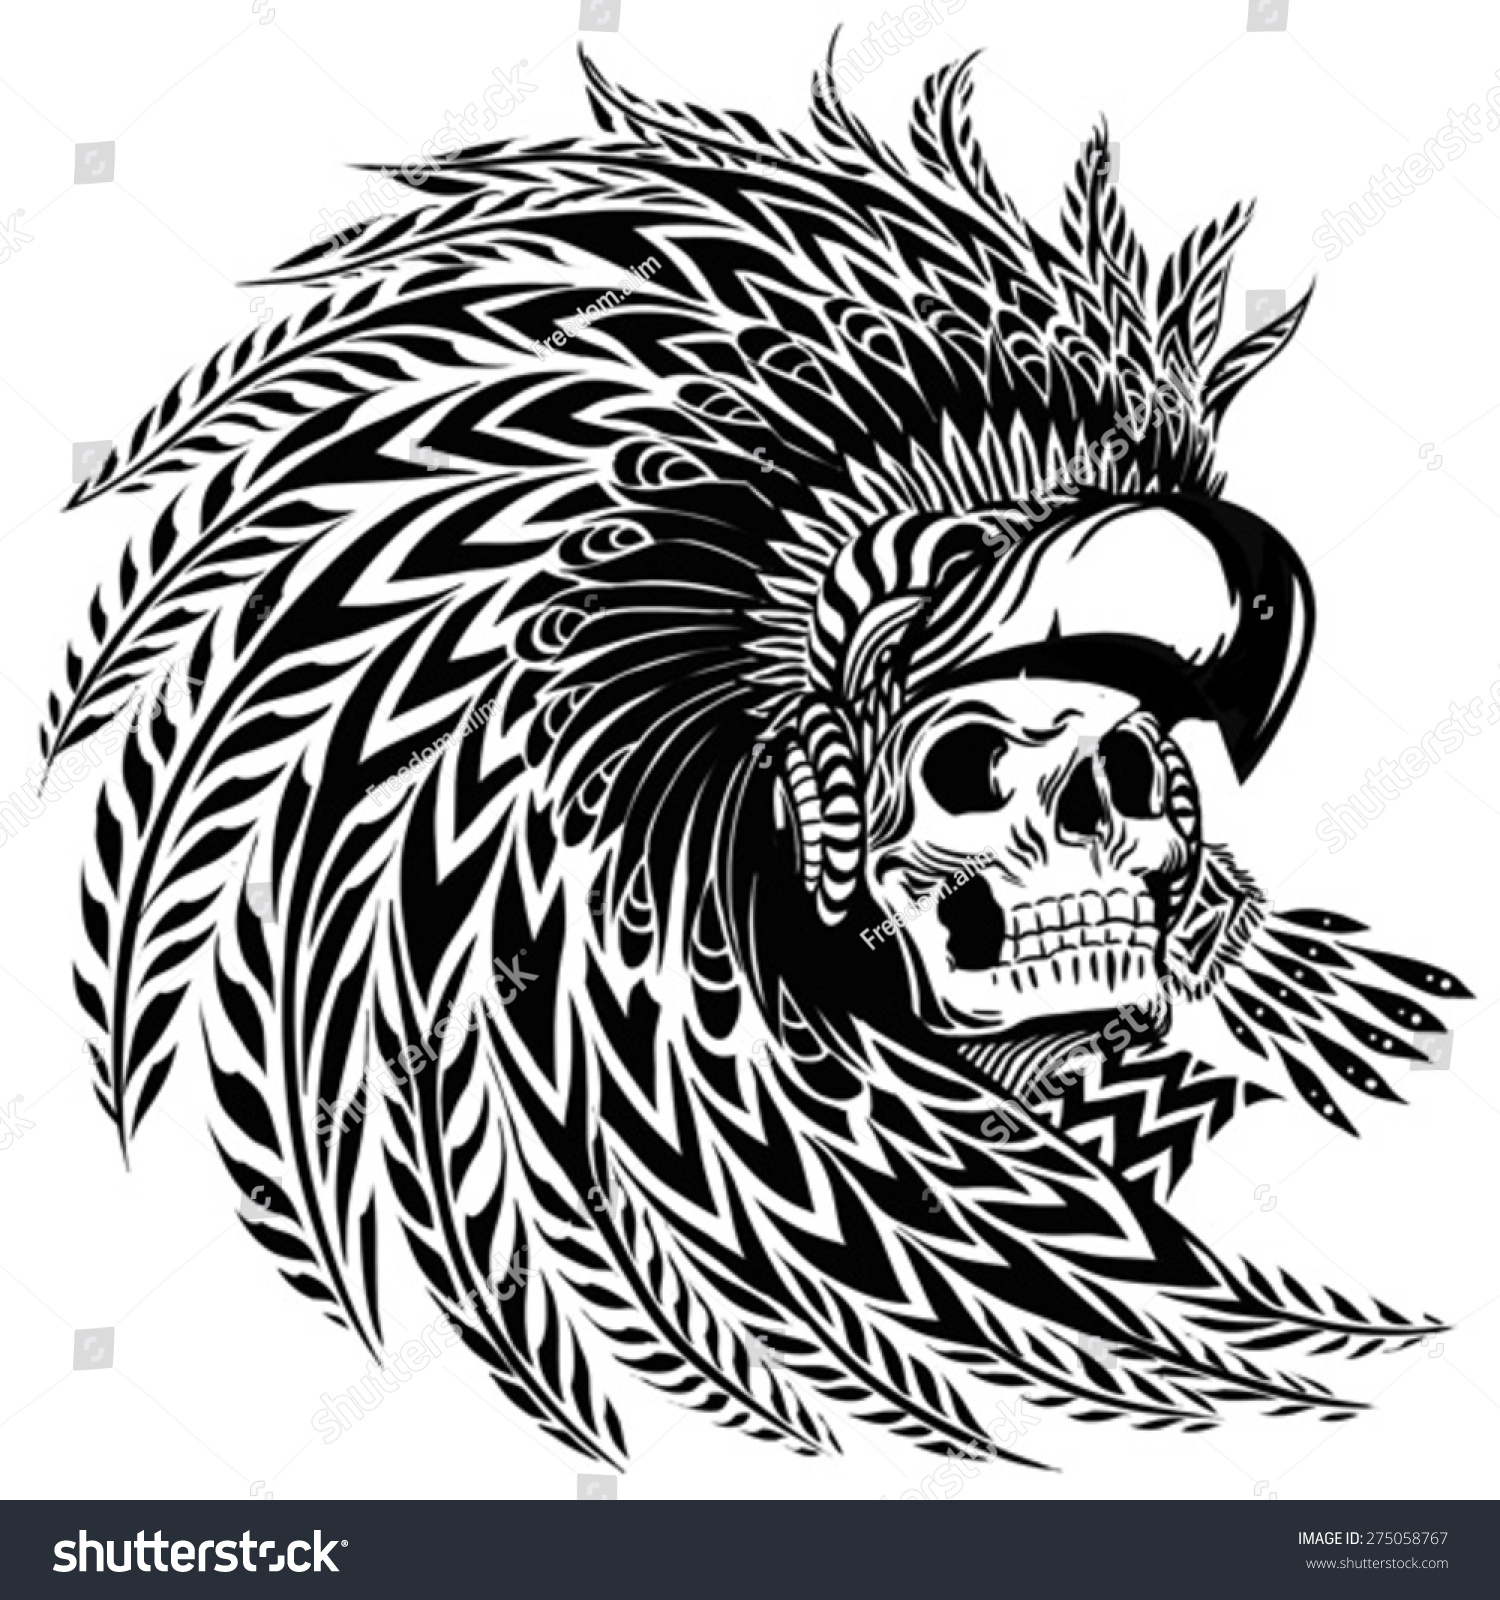 Aztec Temple Tattoo tattoo aztec warrior stock image   download now